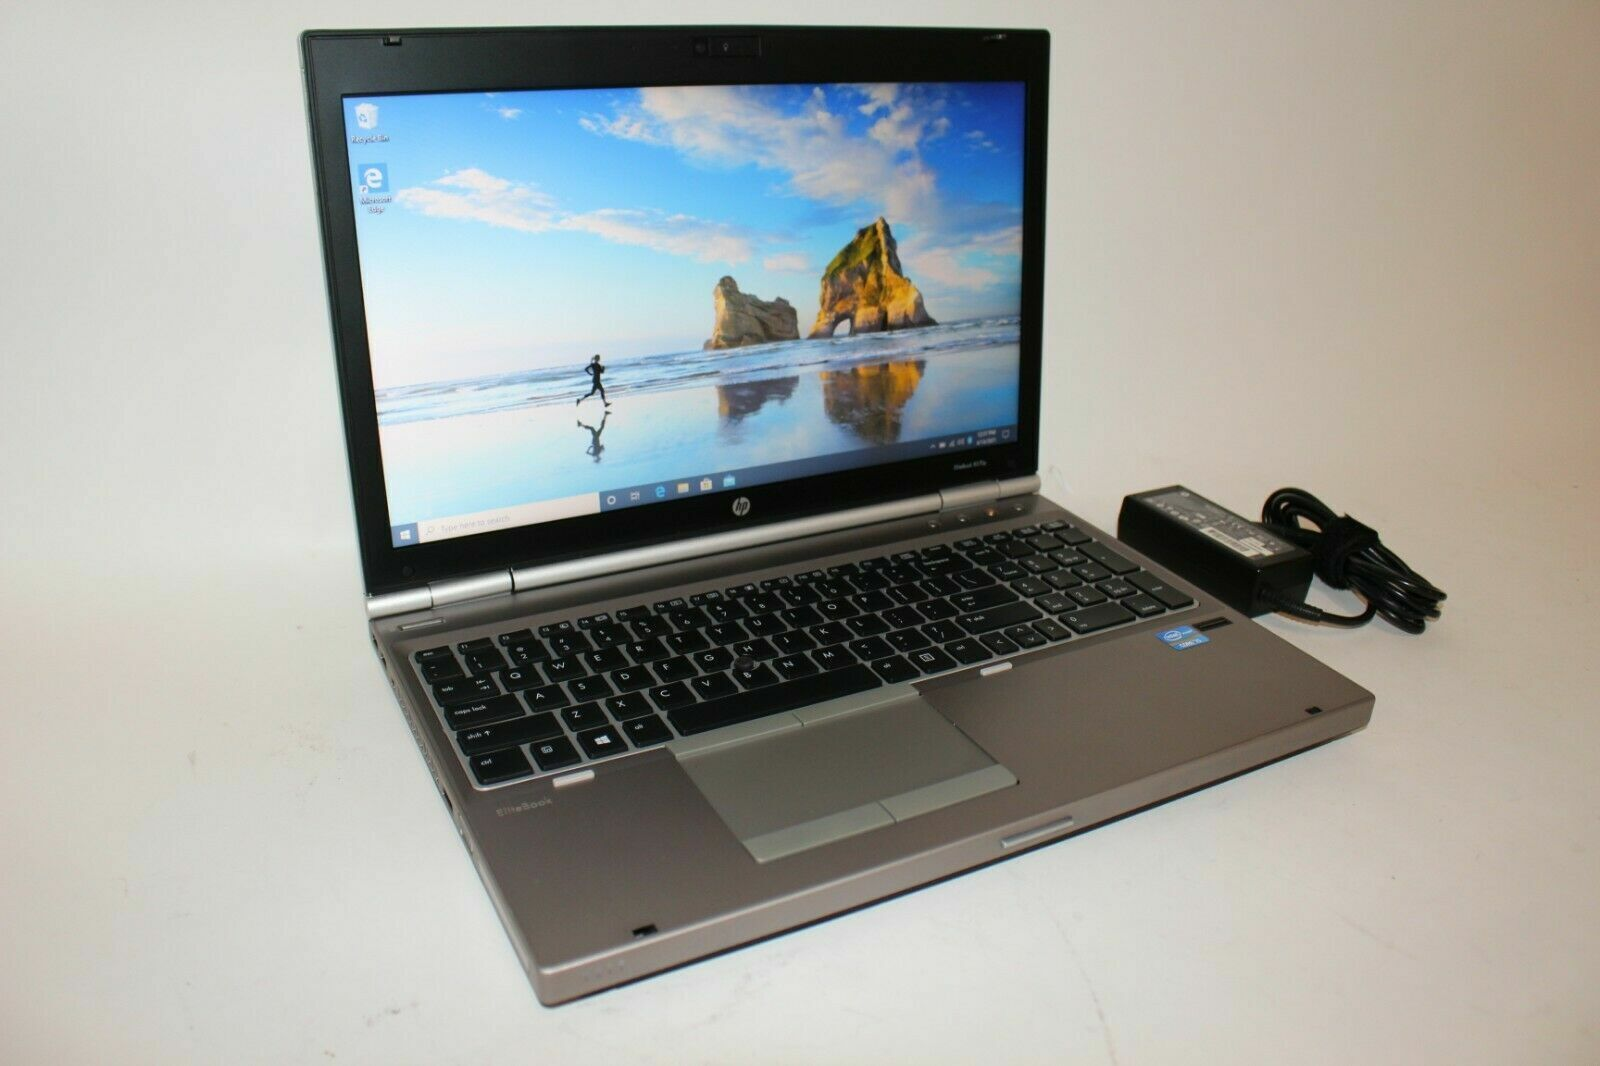 "Laptop Windows - HP EliteBook 8570p Core i5 15.6"" Windows 10 Pro Laptop 320GB 4GB - SEE PICS"